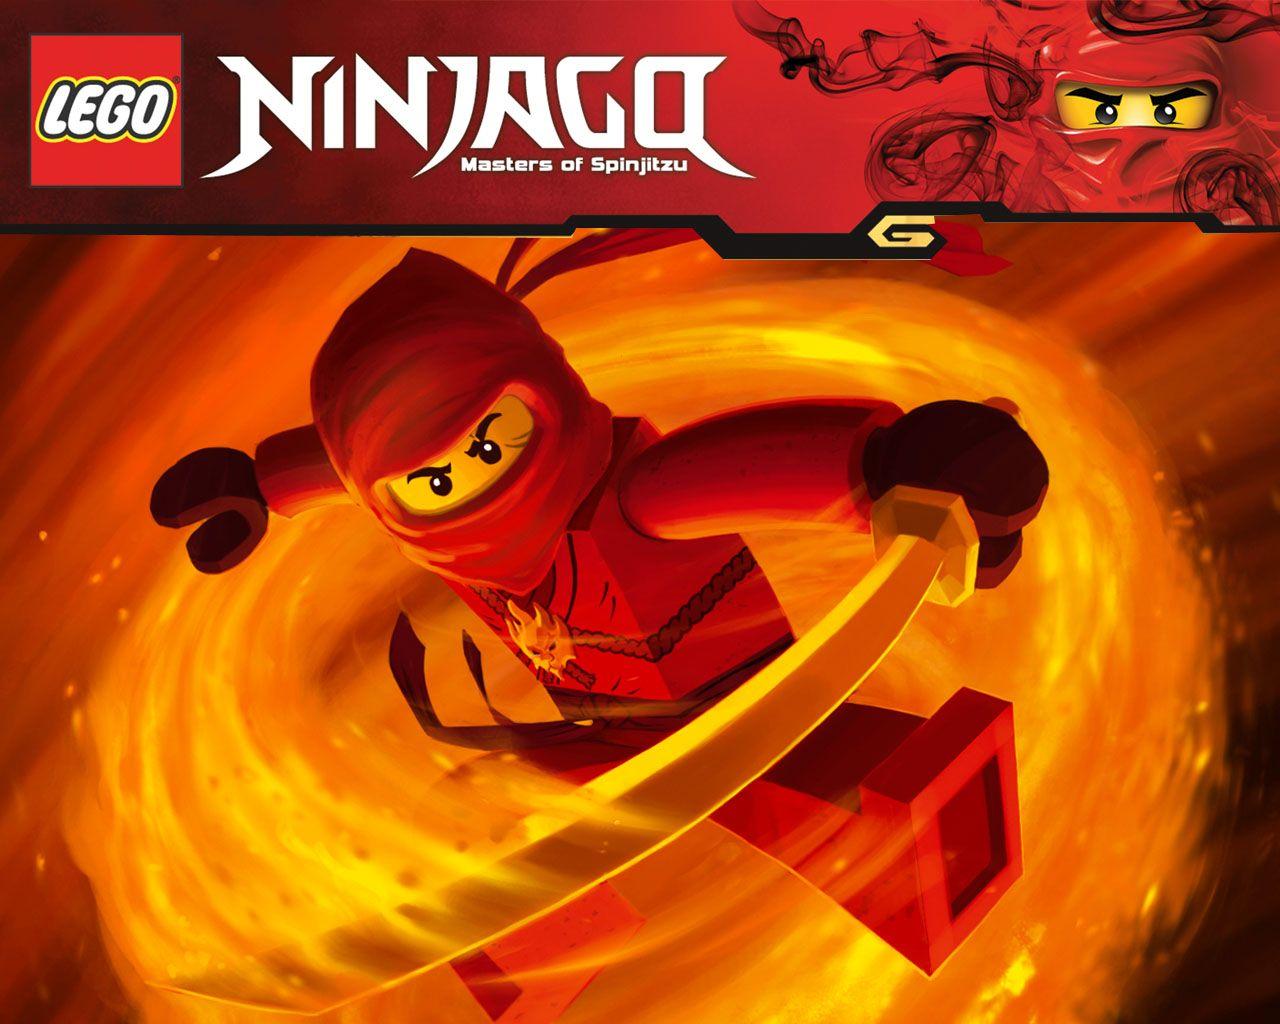 Colouring Pages Boy Girl : Pin lego ninjago print colouring pages ajilbabcom portal